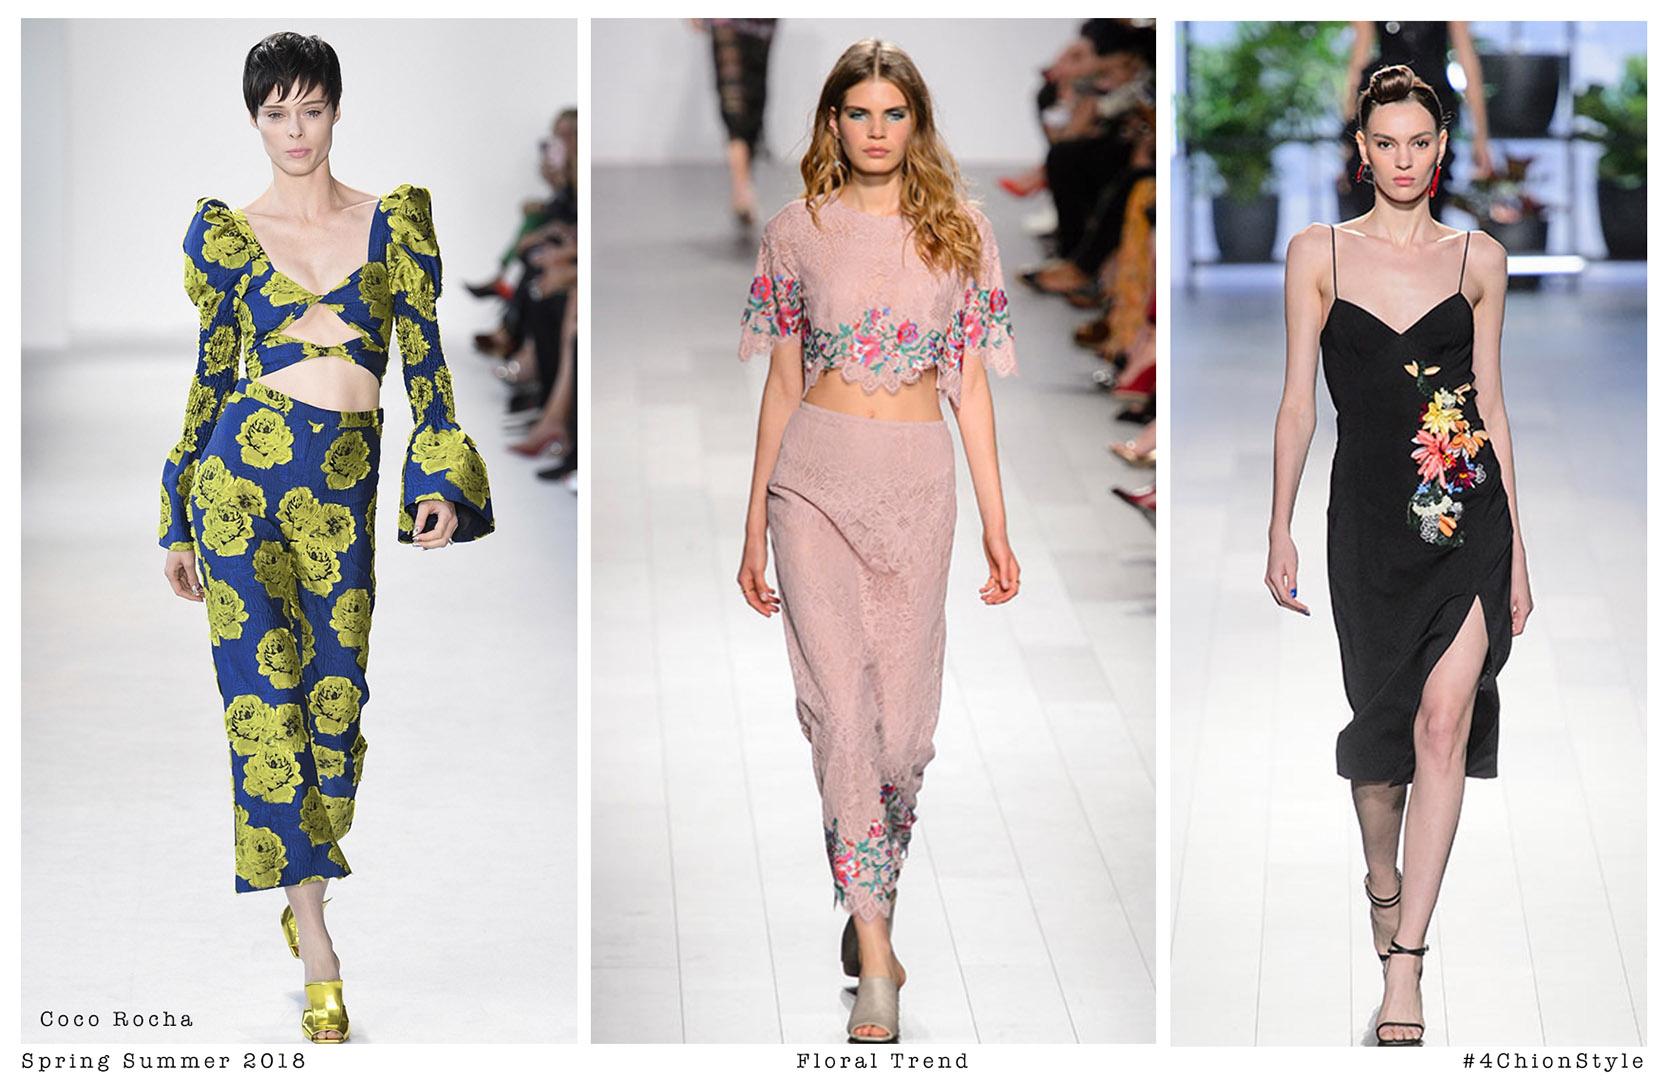 Dress trends spring summer 2018